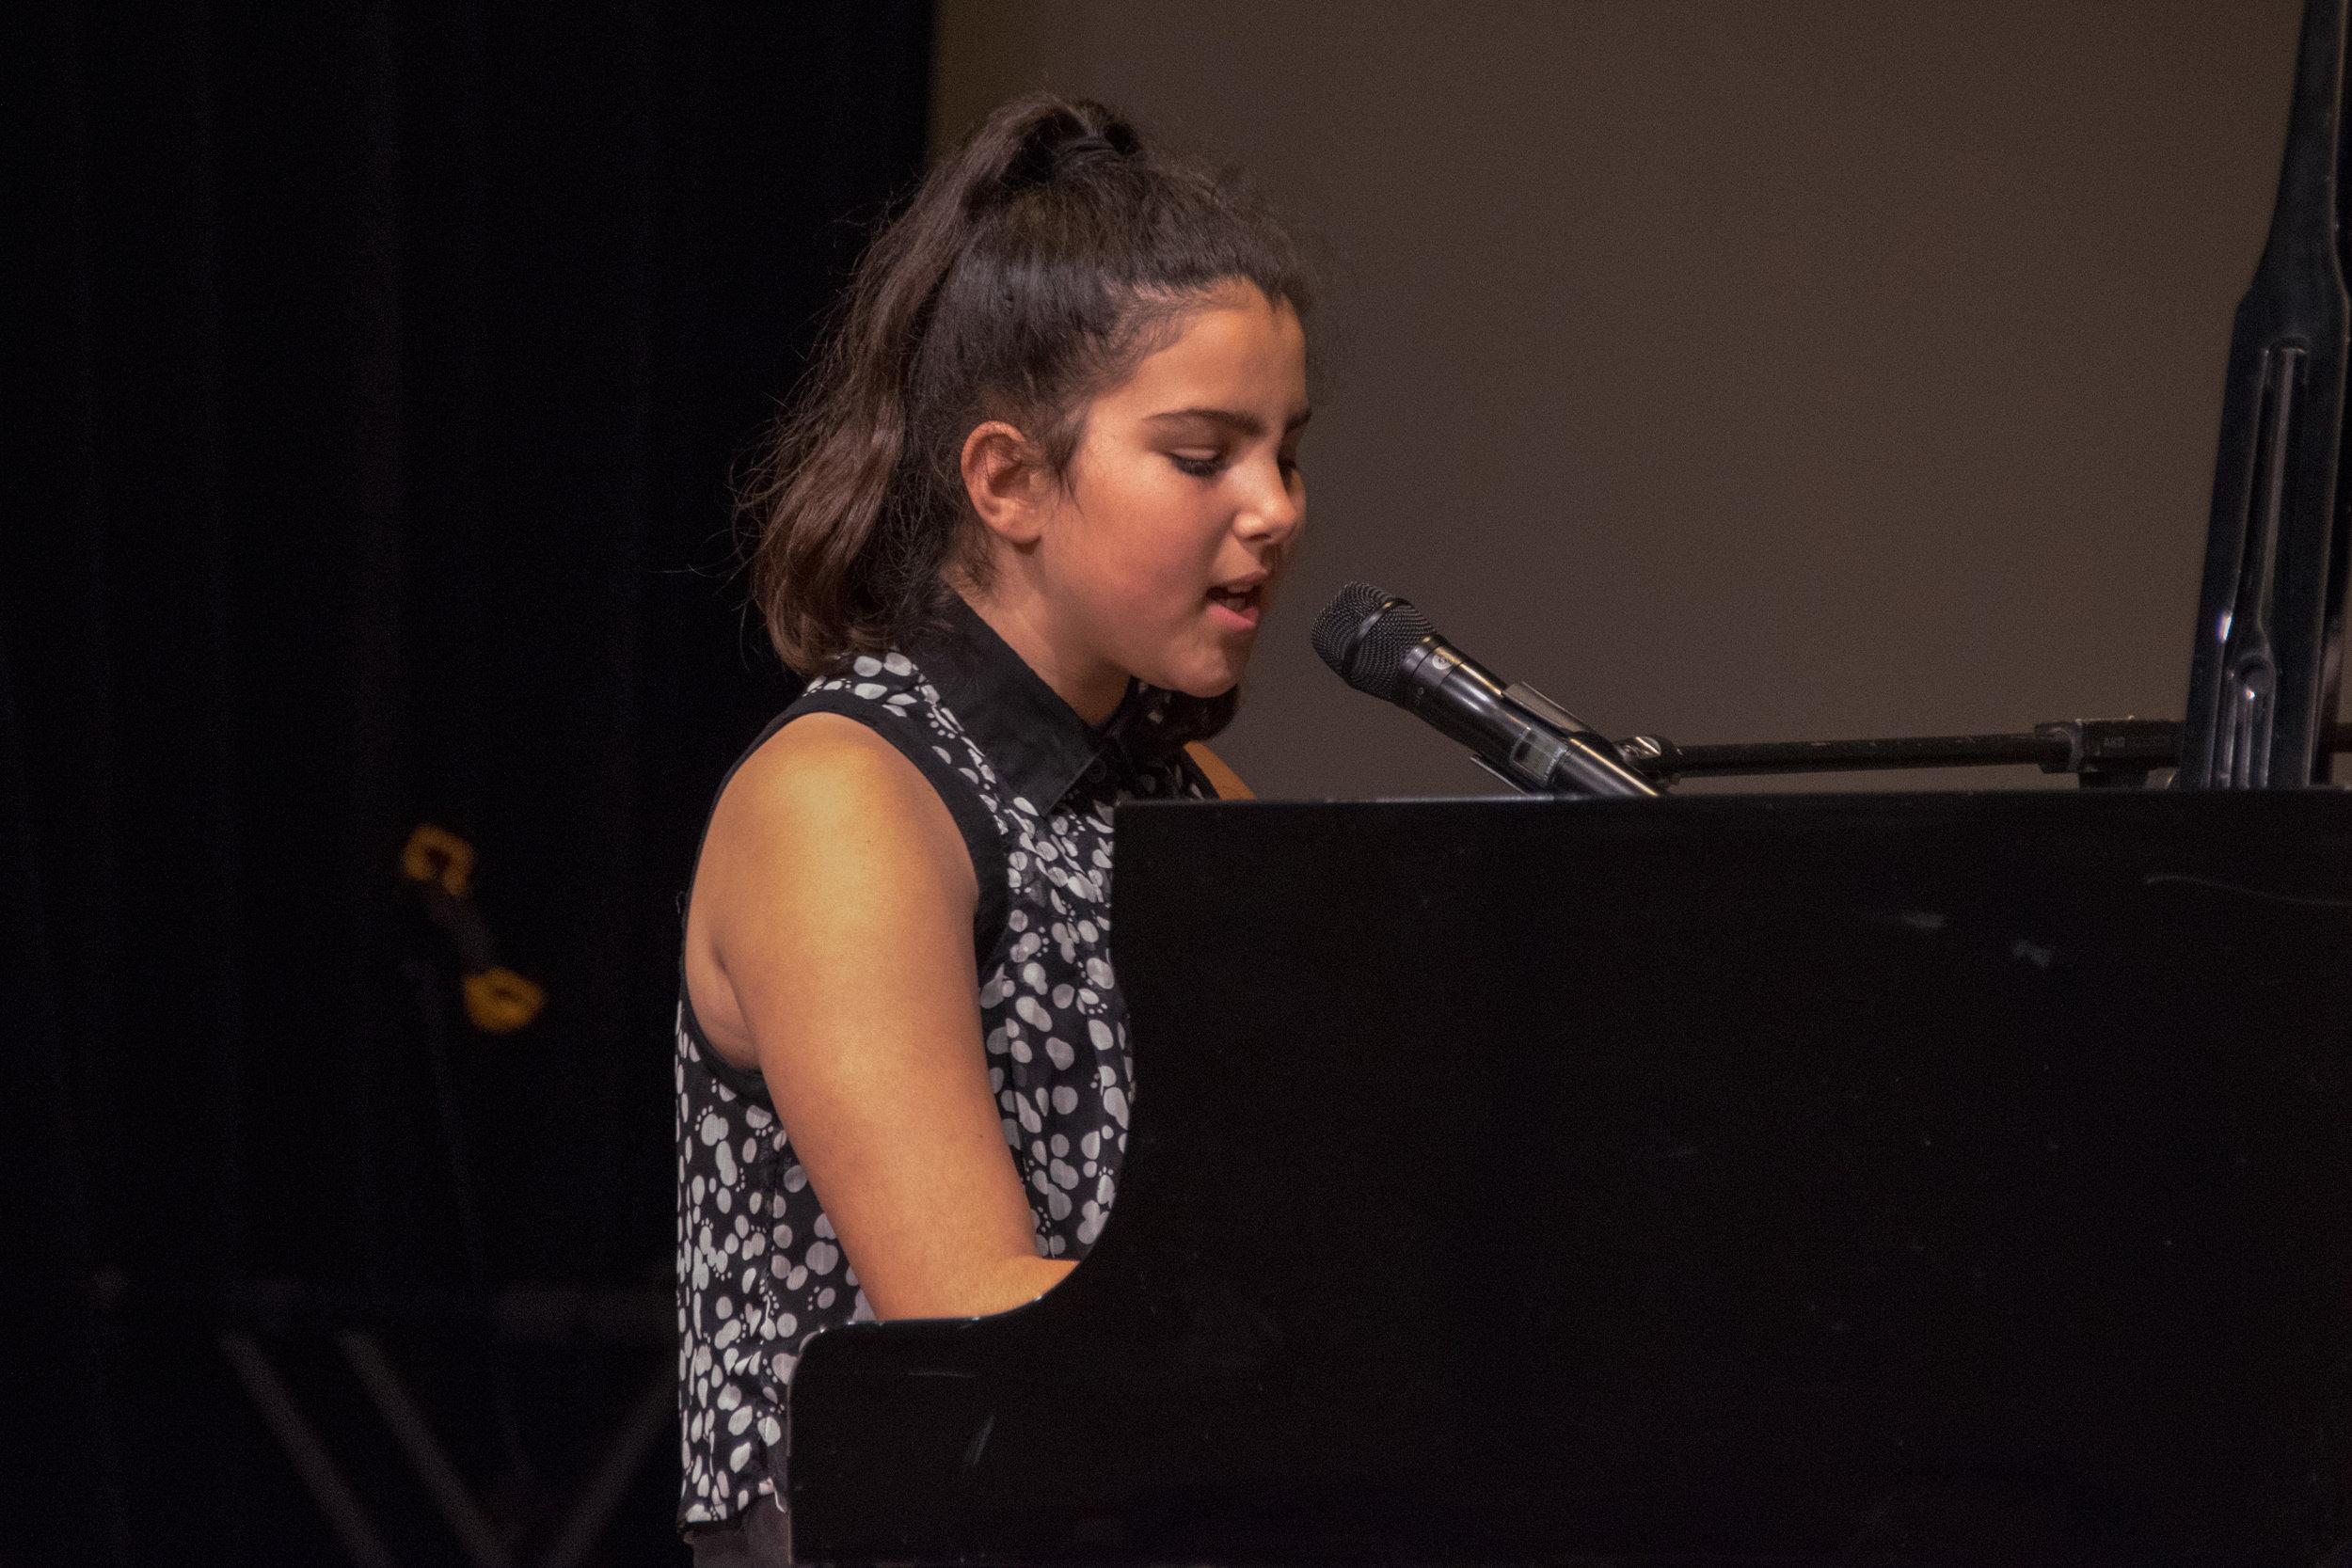 Mikalah Hanna